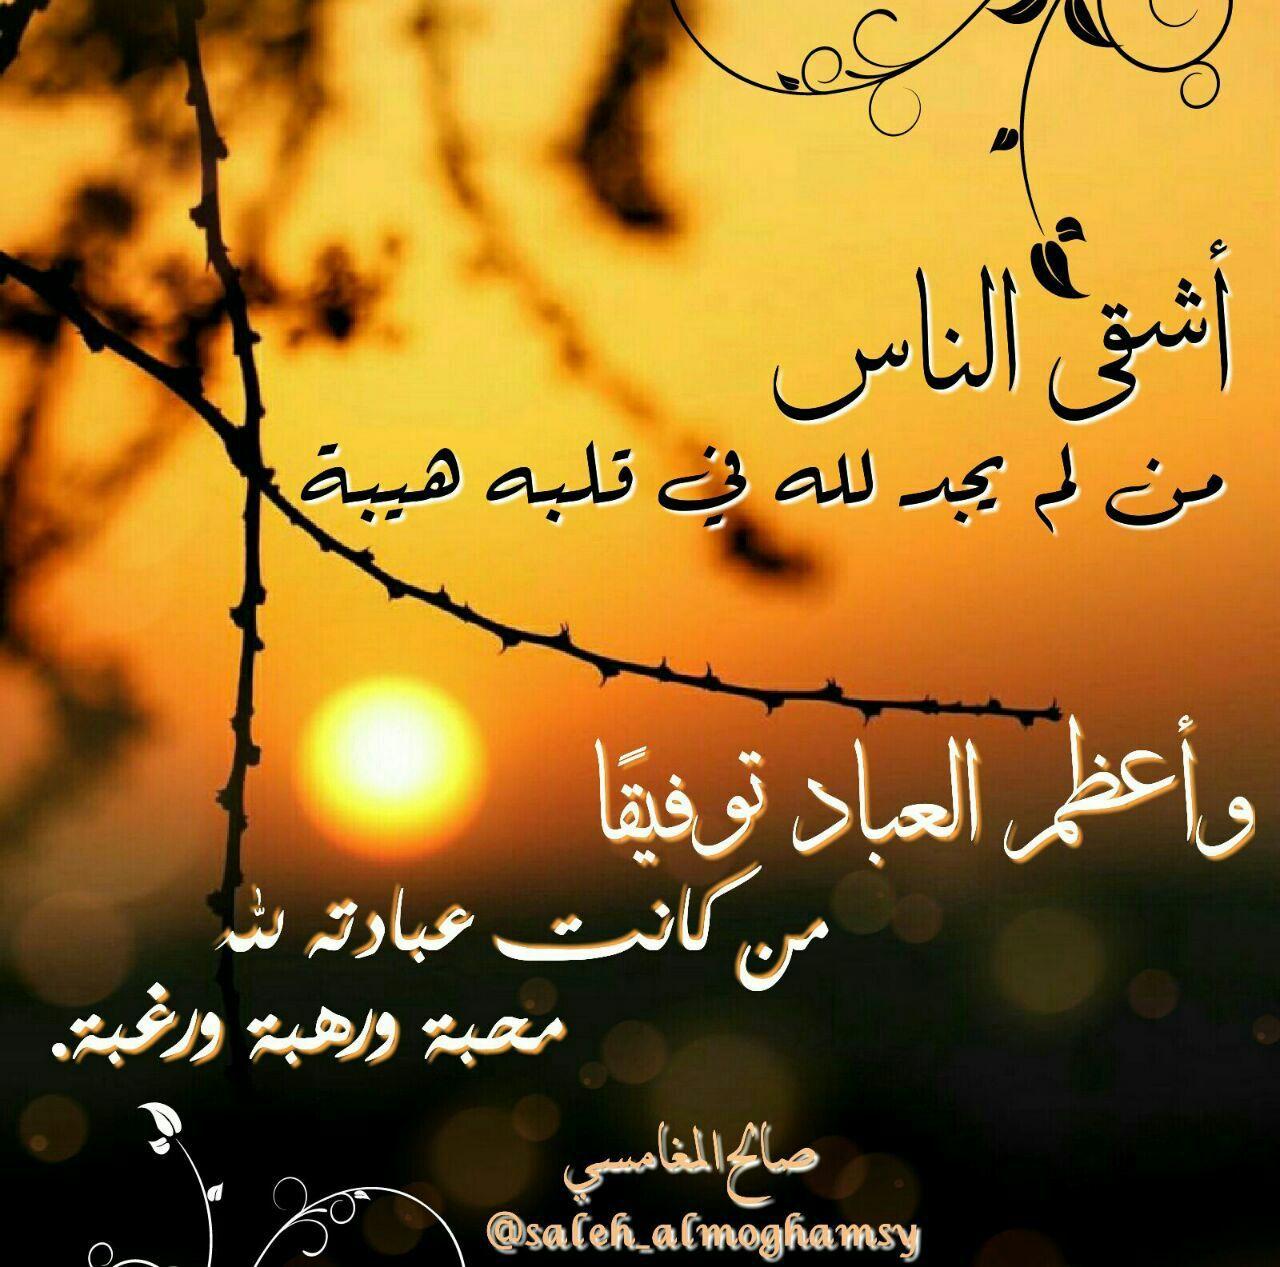 مدونة عمو Arabic Calligraphy Poster Calligraphy